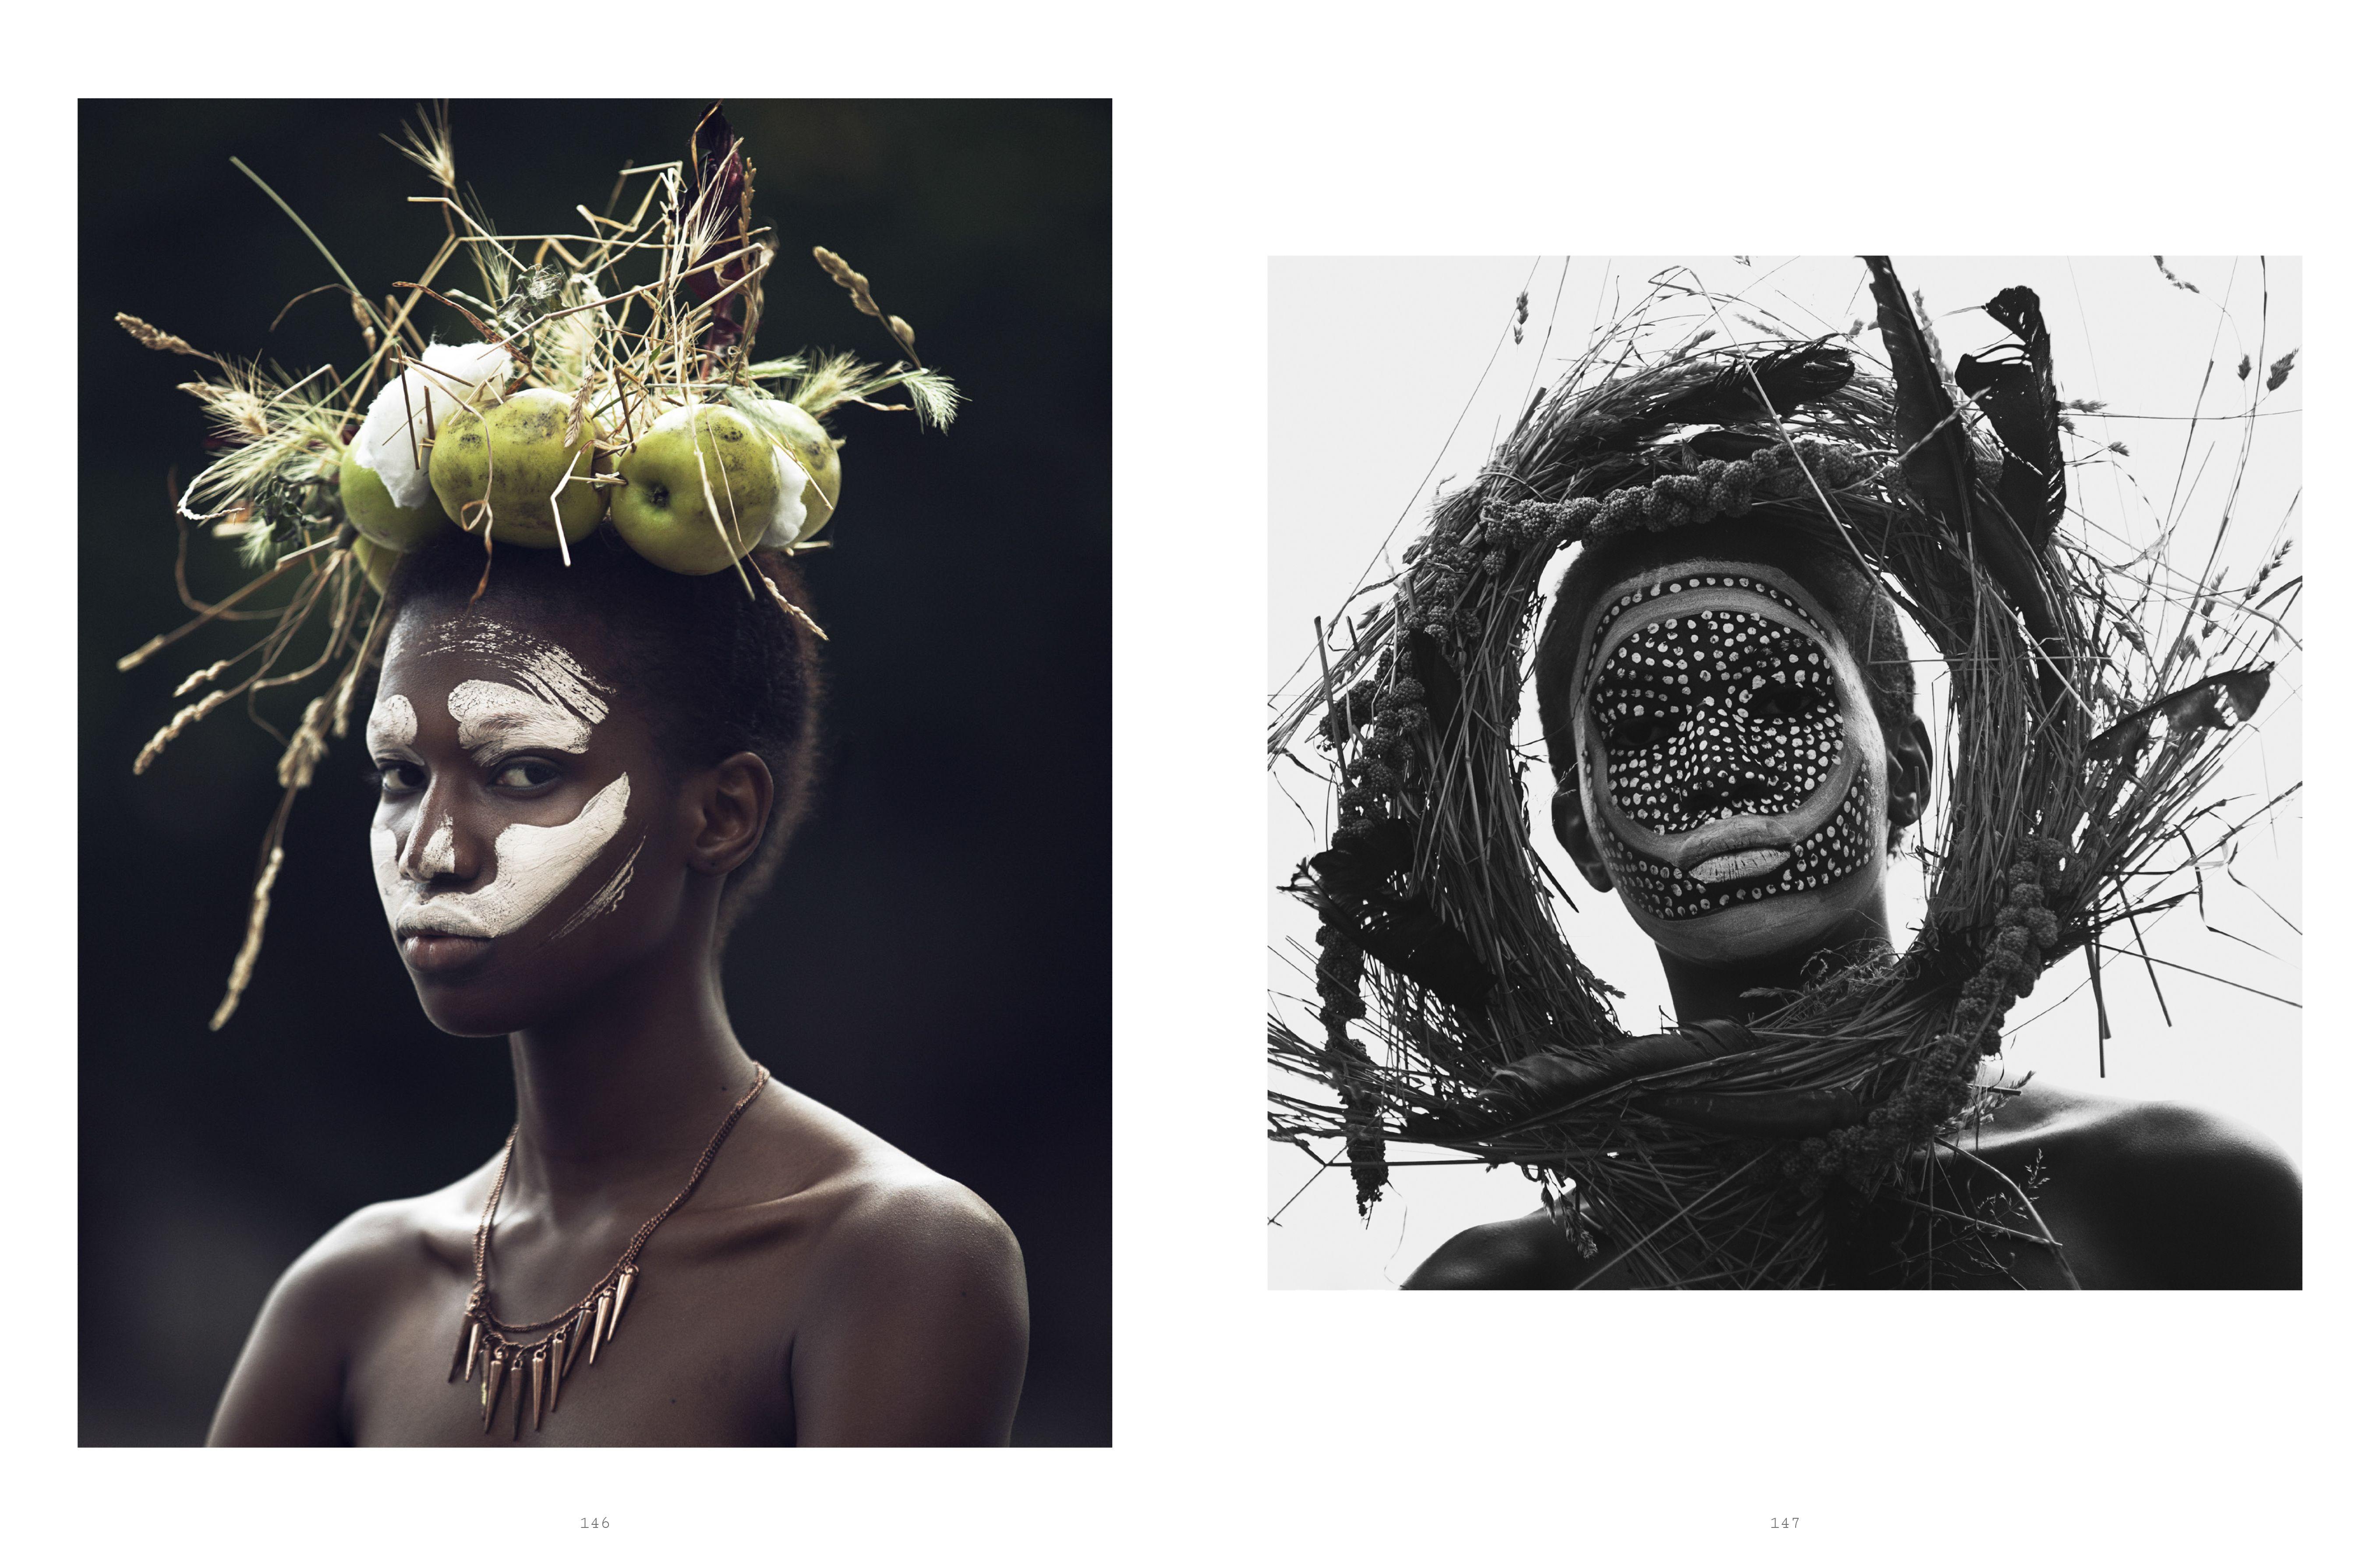 "OOB mag - www.oobmag.com ""I HAVE A DREAM"" Photographer: Paul Morel Sylist: Margot Billion Makeup: Virginie Rascle Model: Thia @ Metropolitan Agency Photo assistant: Julien Dauvillier"